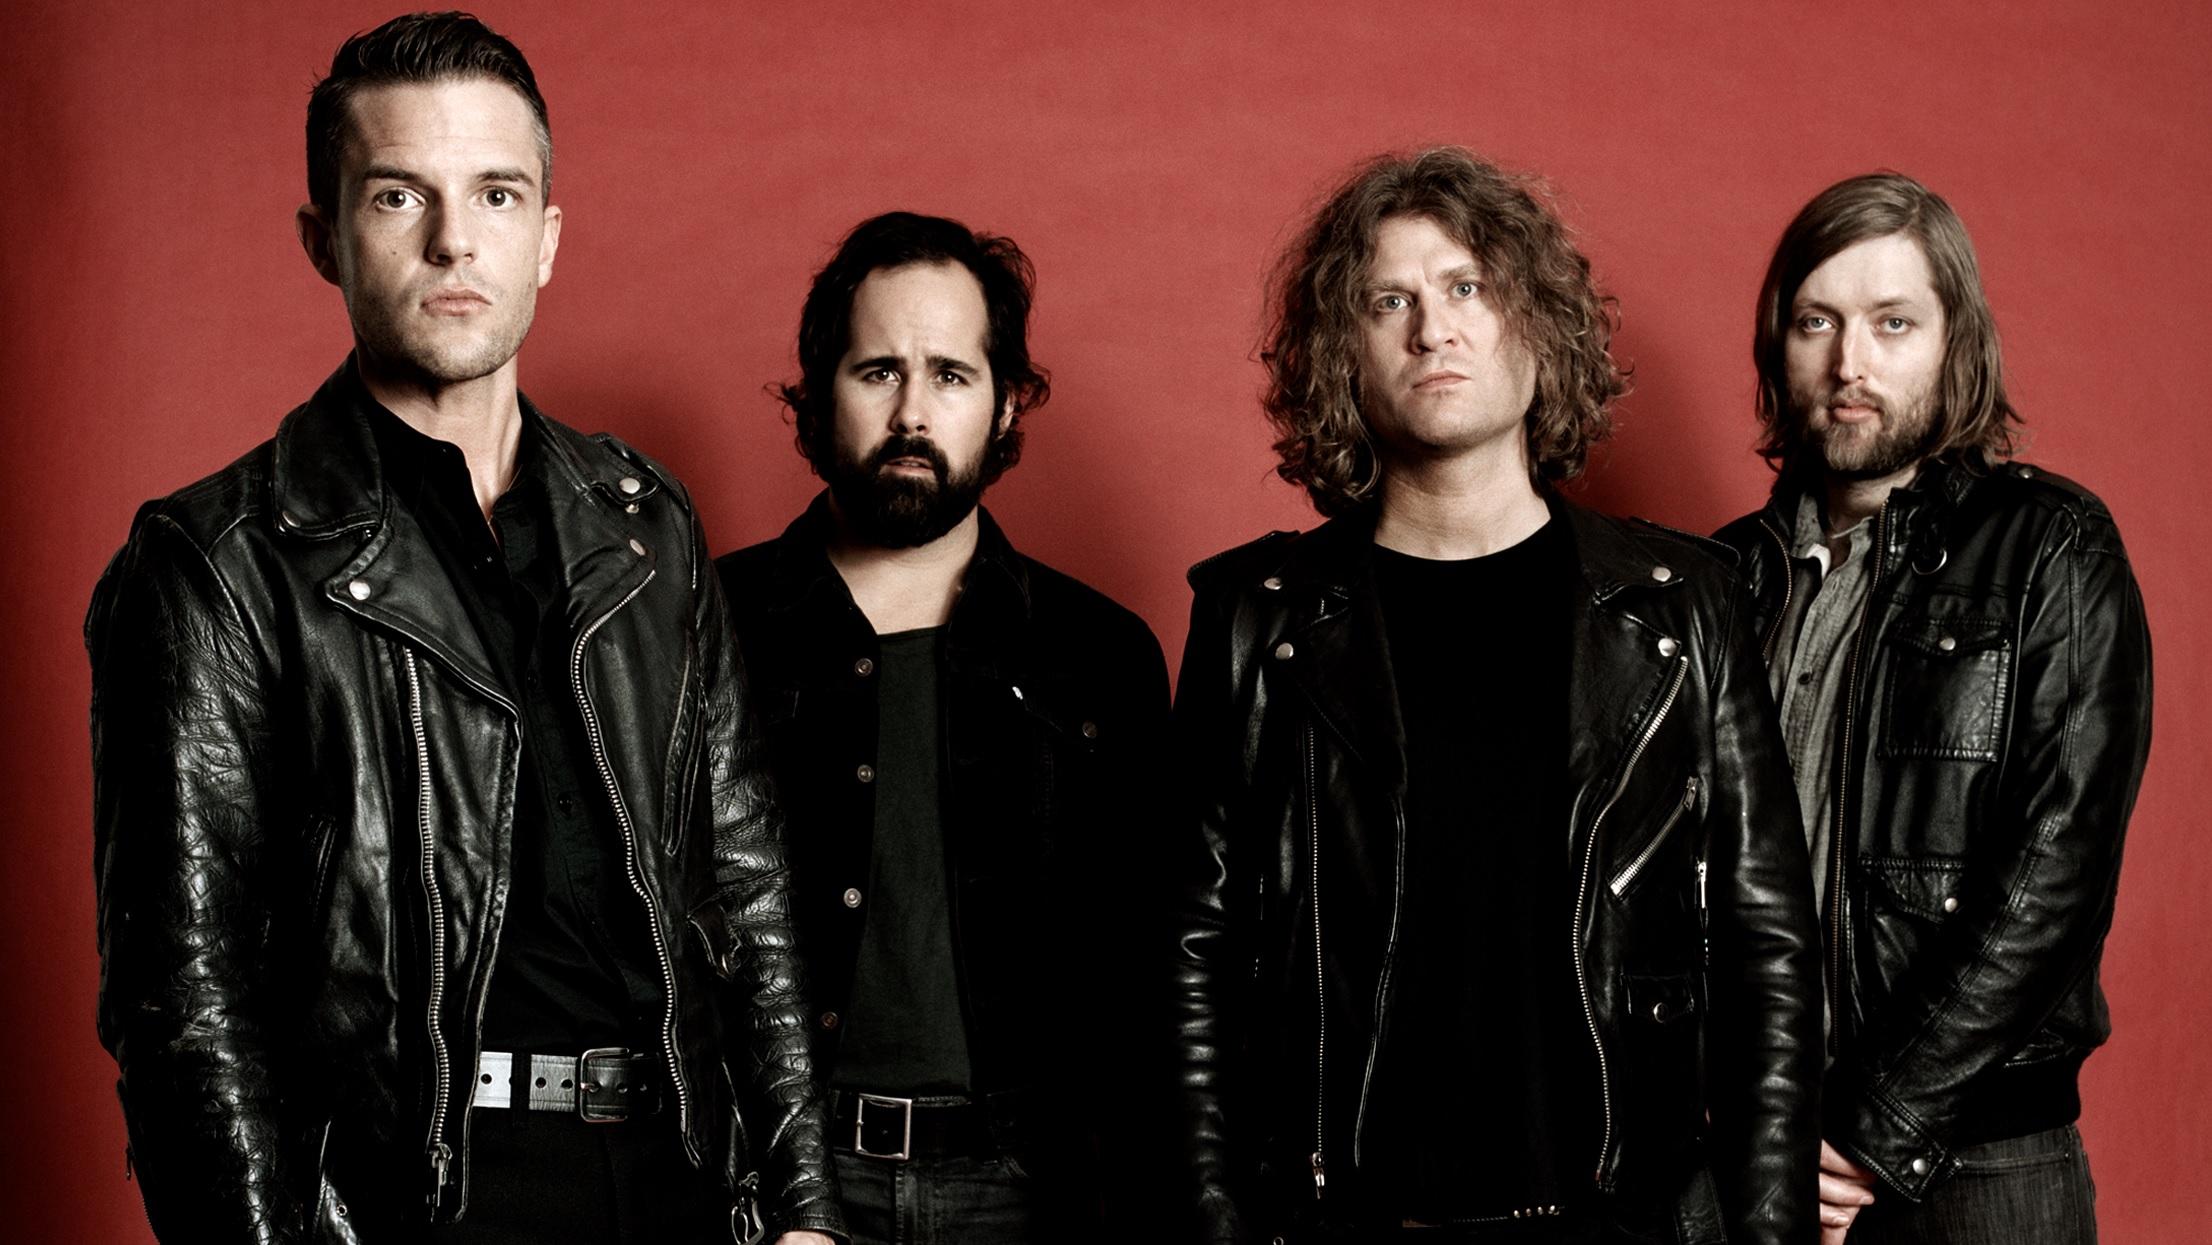 The Killers coveroi Musea Lollapaloozassa